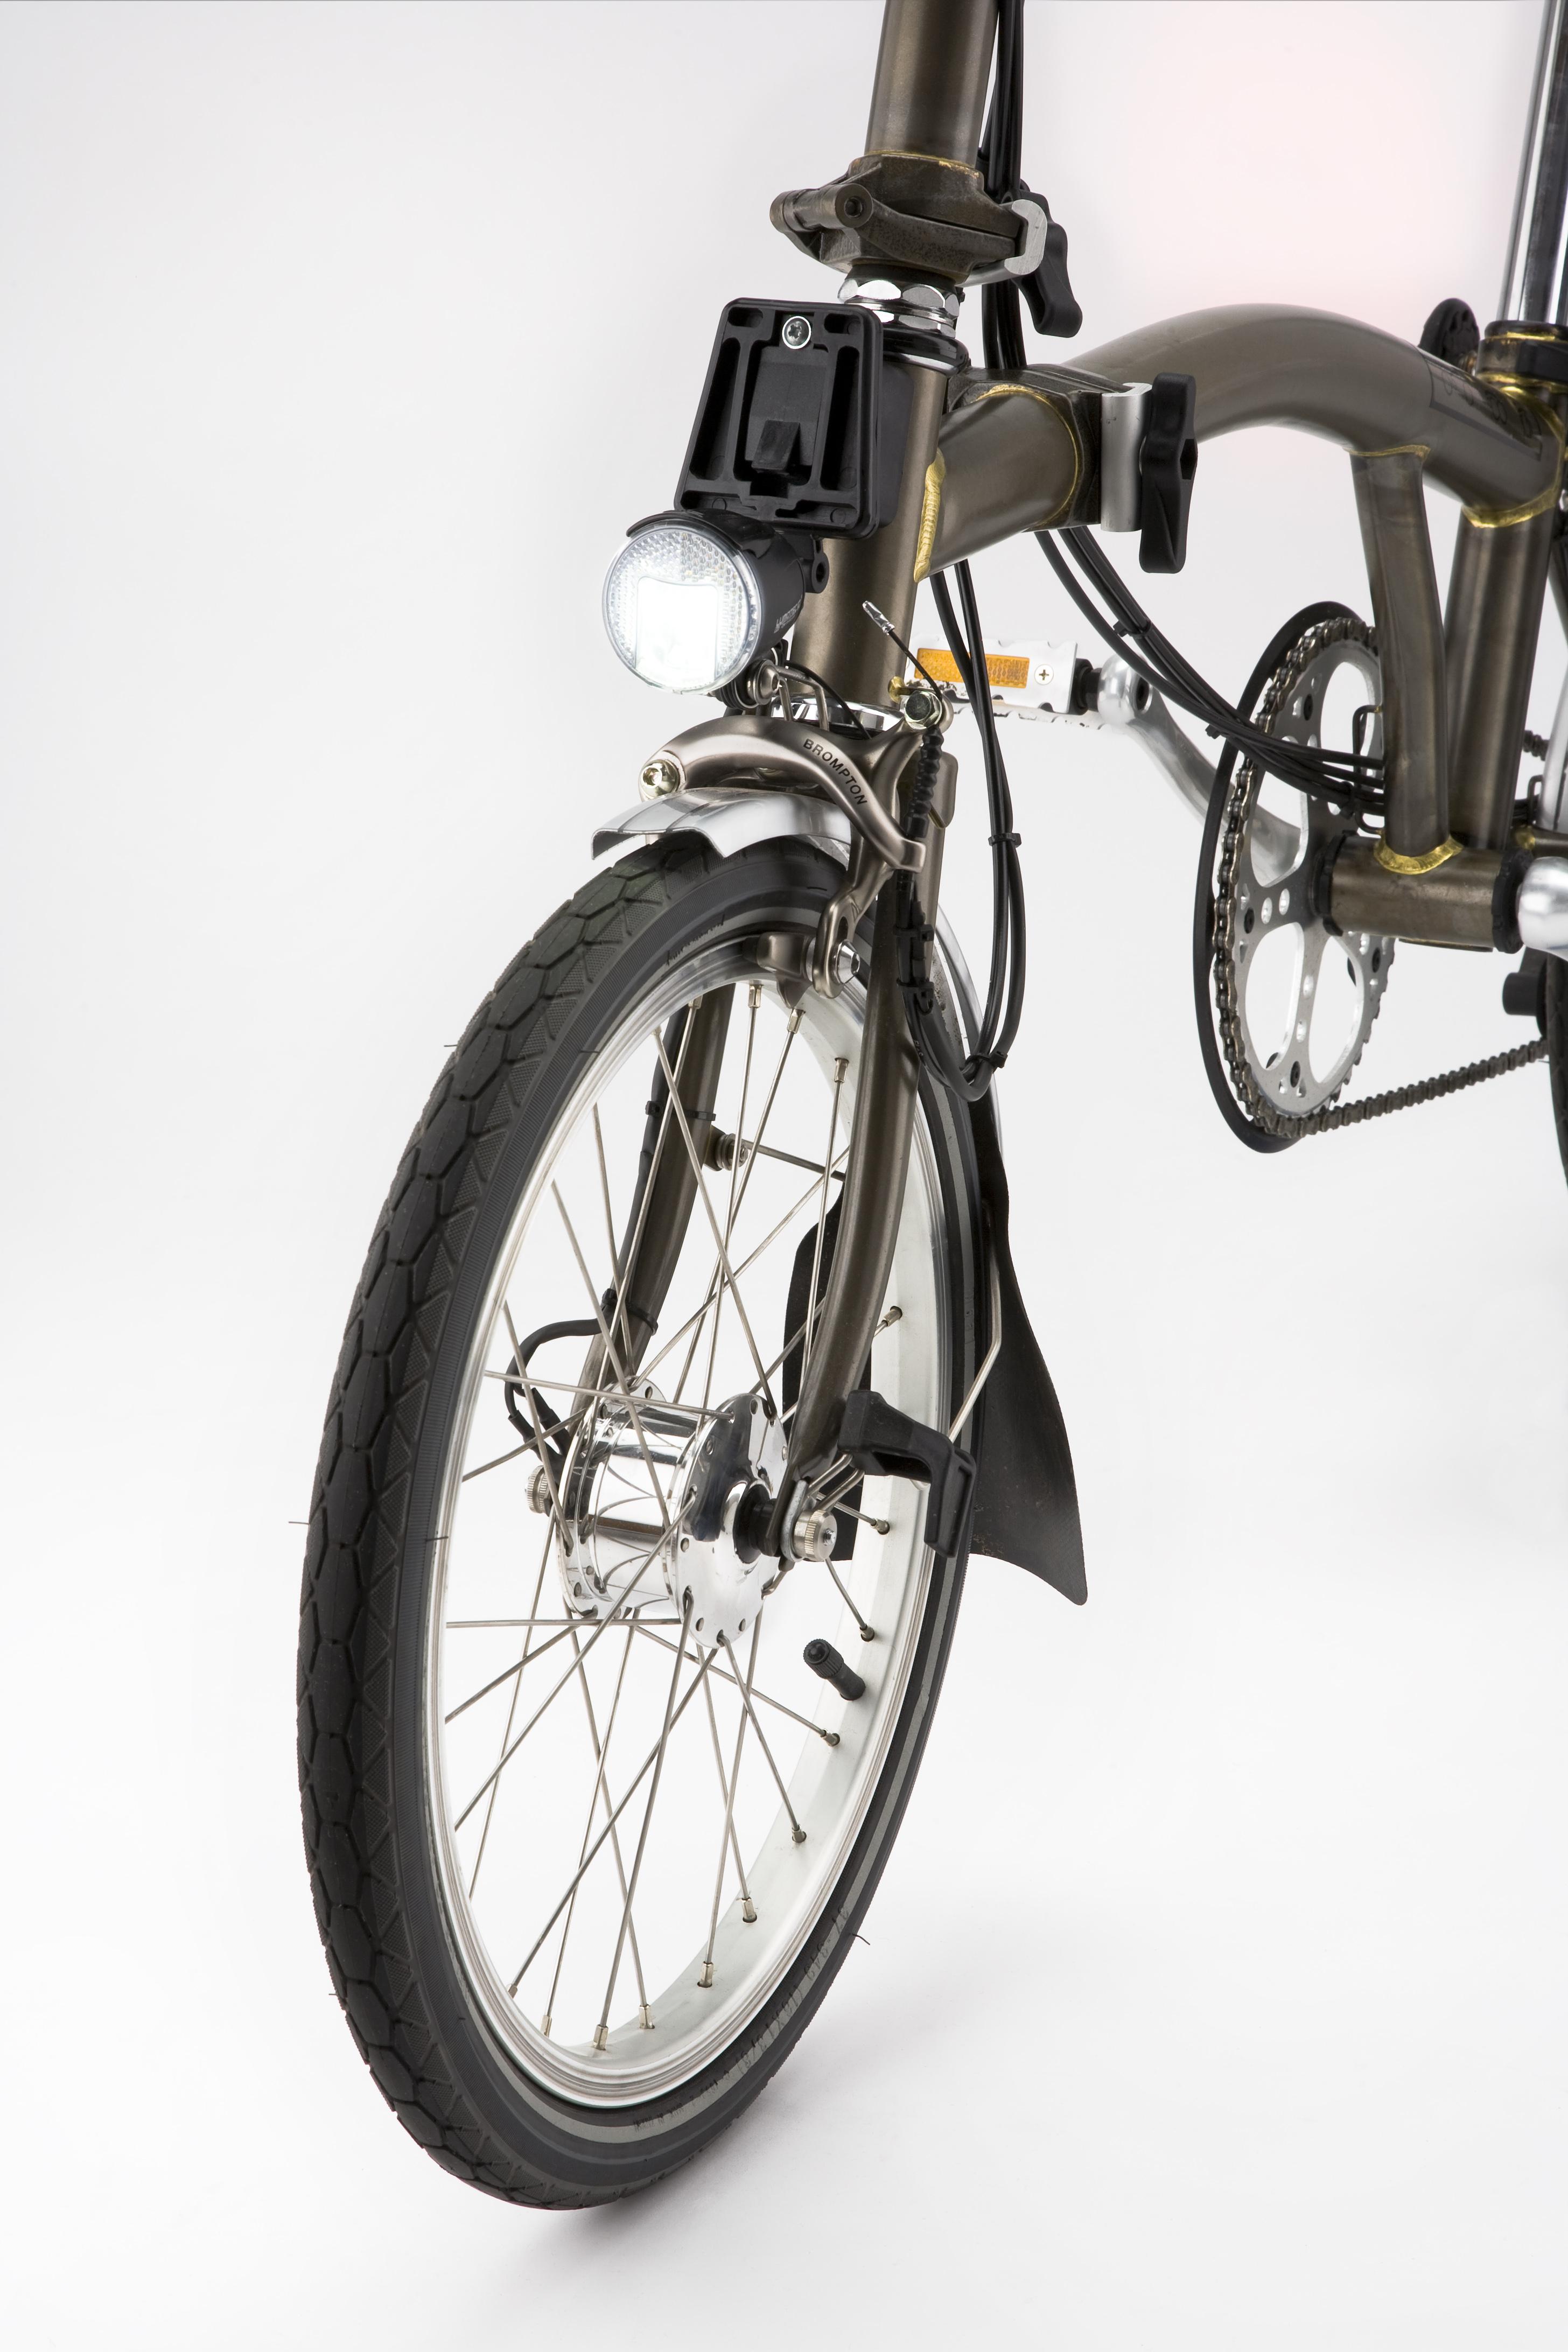 Verlichting | Bikeshop Amersfoort